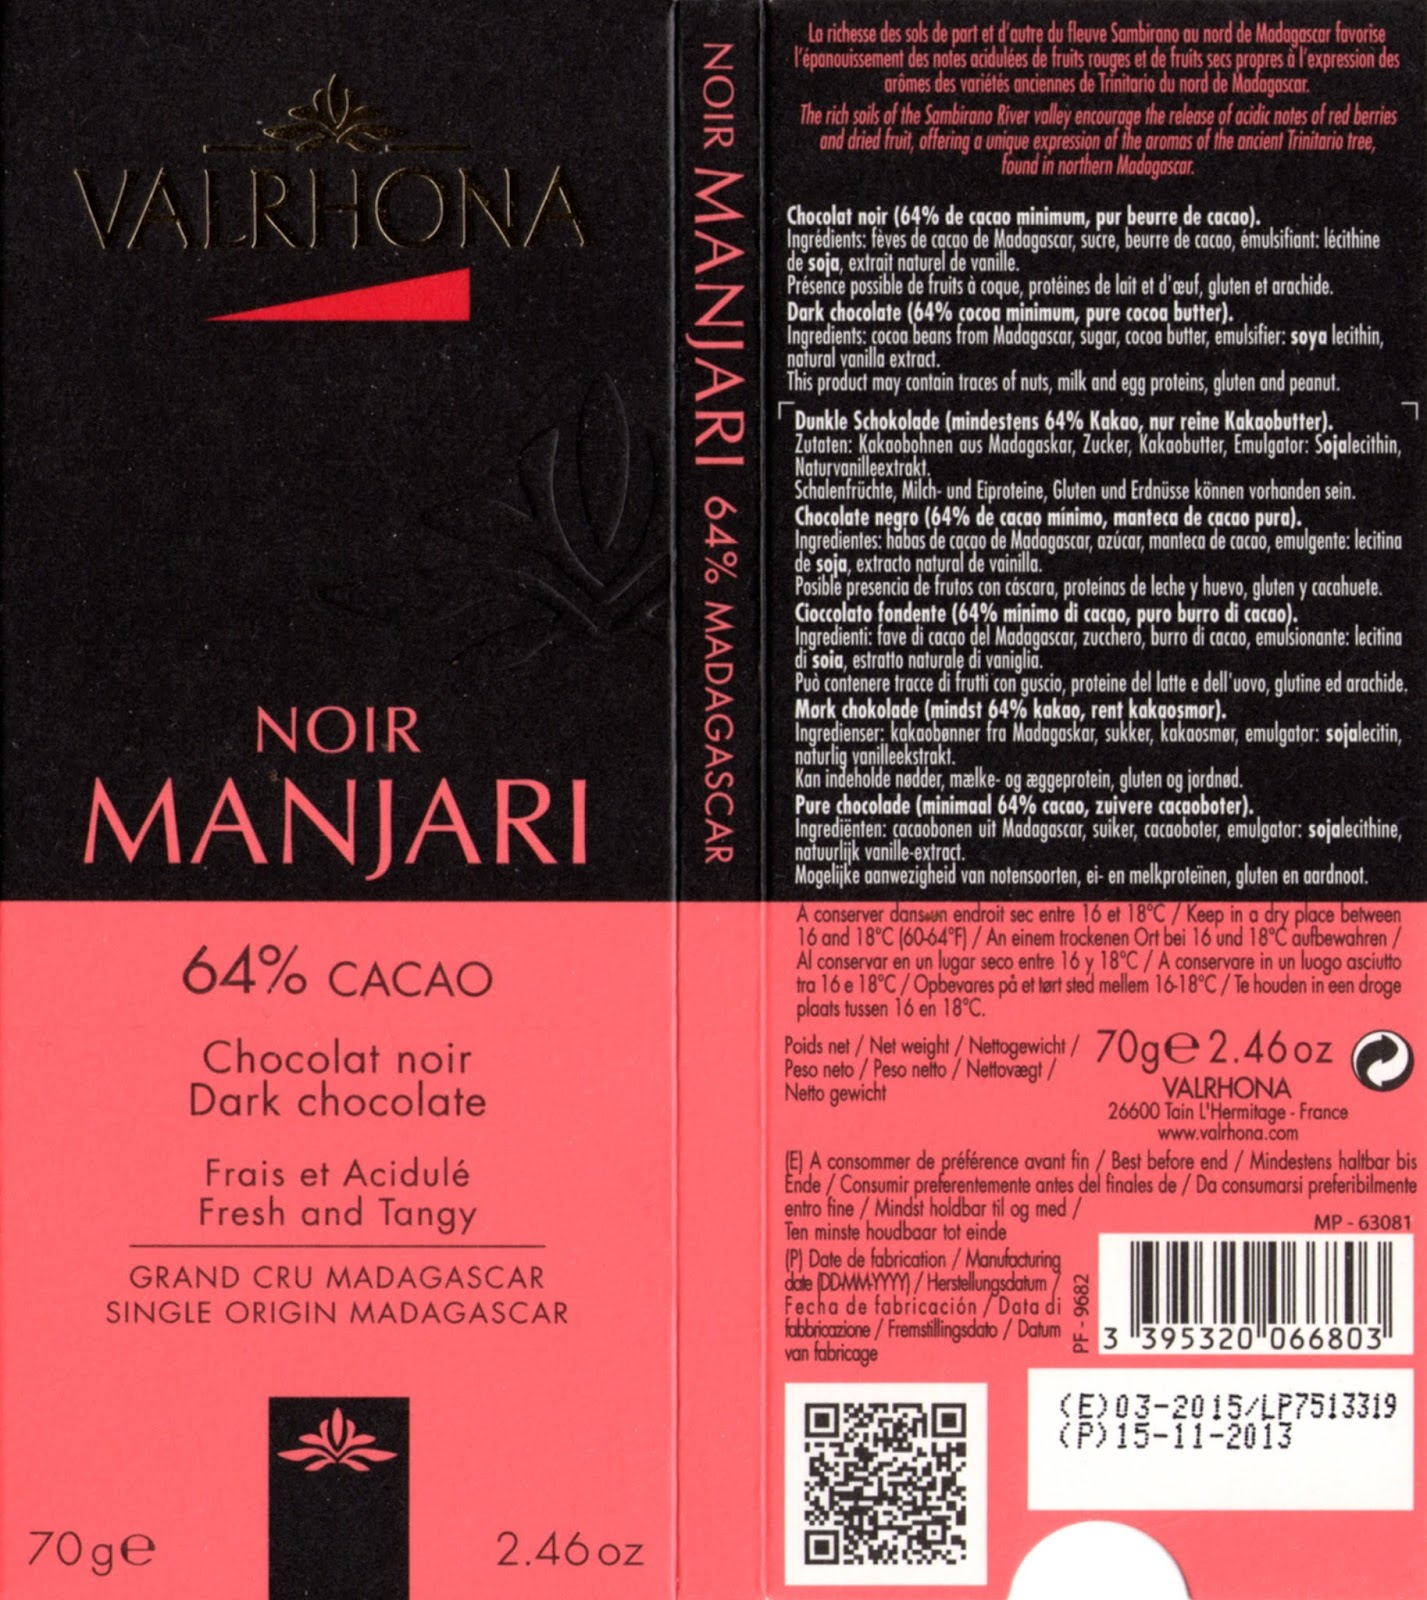 tablette de chocolat noir dégustation valrhona noir manjari 64